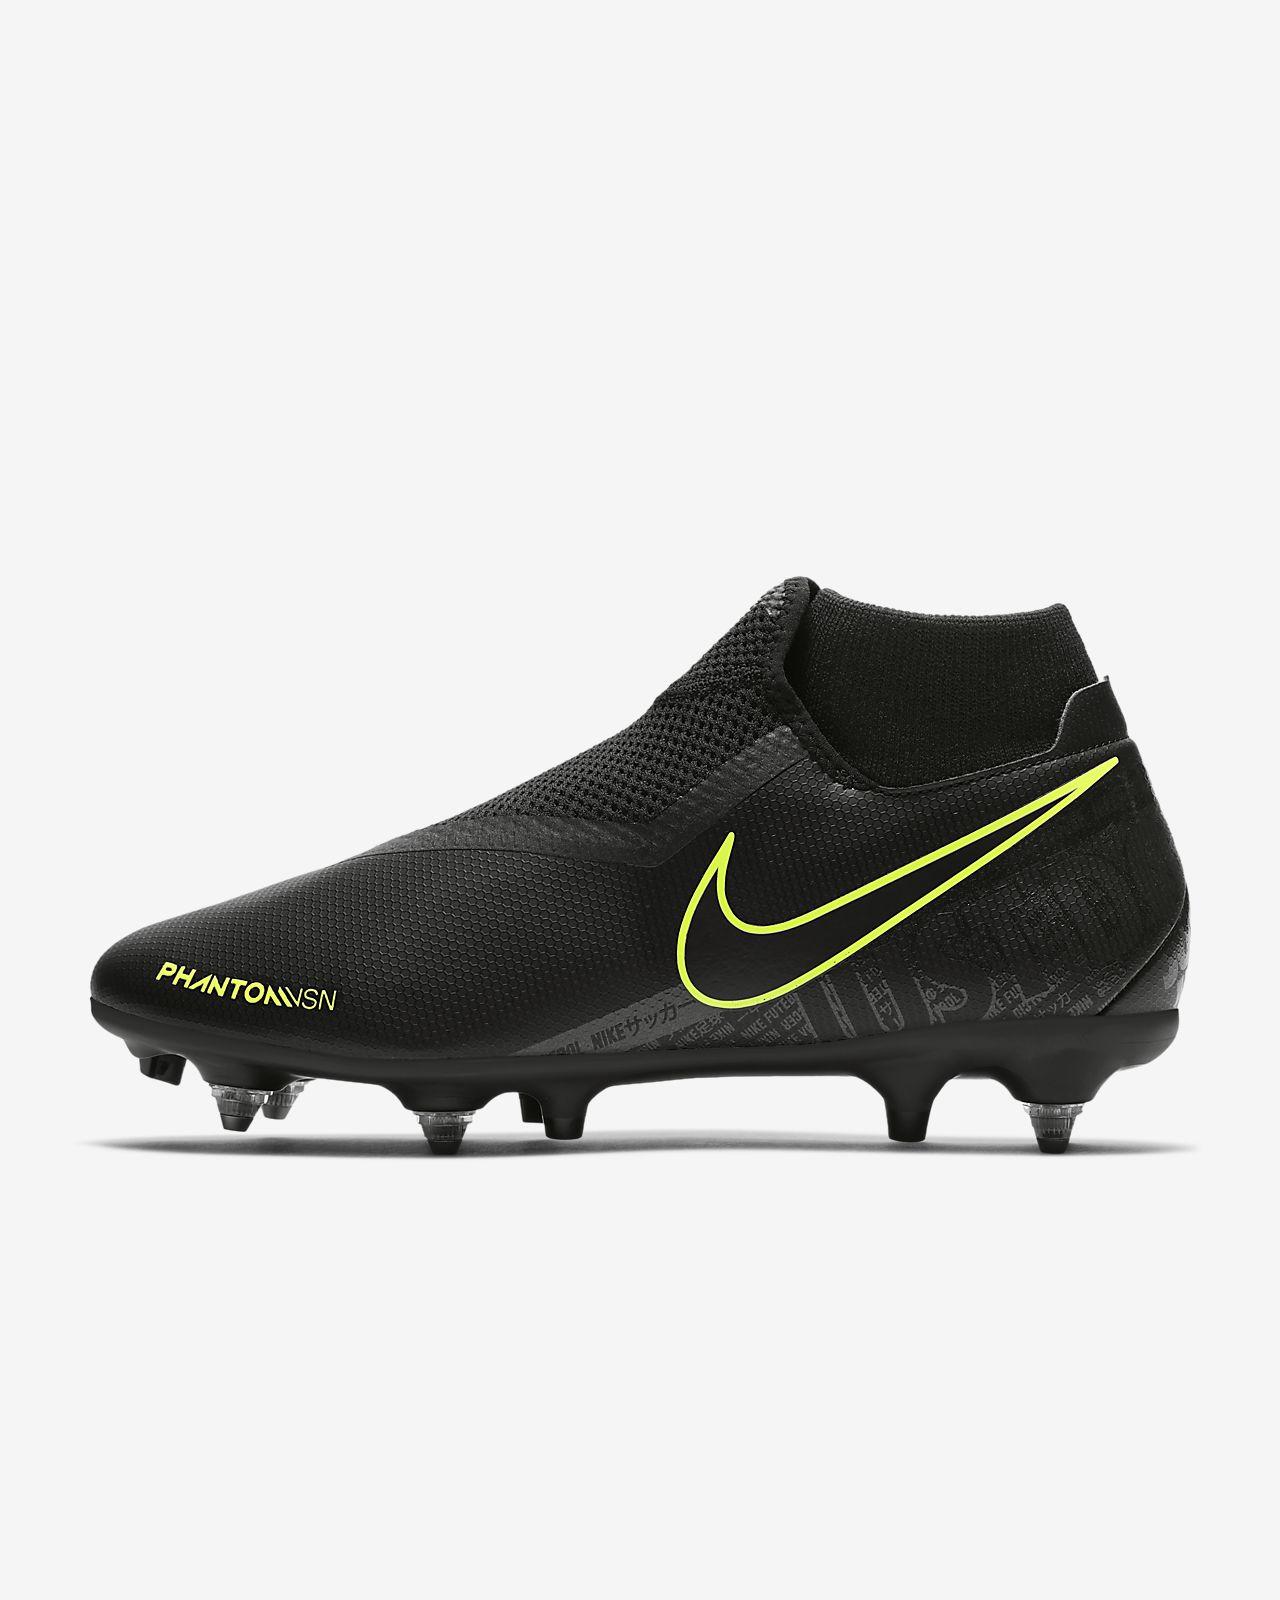 Nike PhantomVSN Academy Dynamic Fit SG-Pro Anti-Clog Traction Botas de fútbol para terreno blando